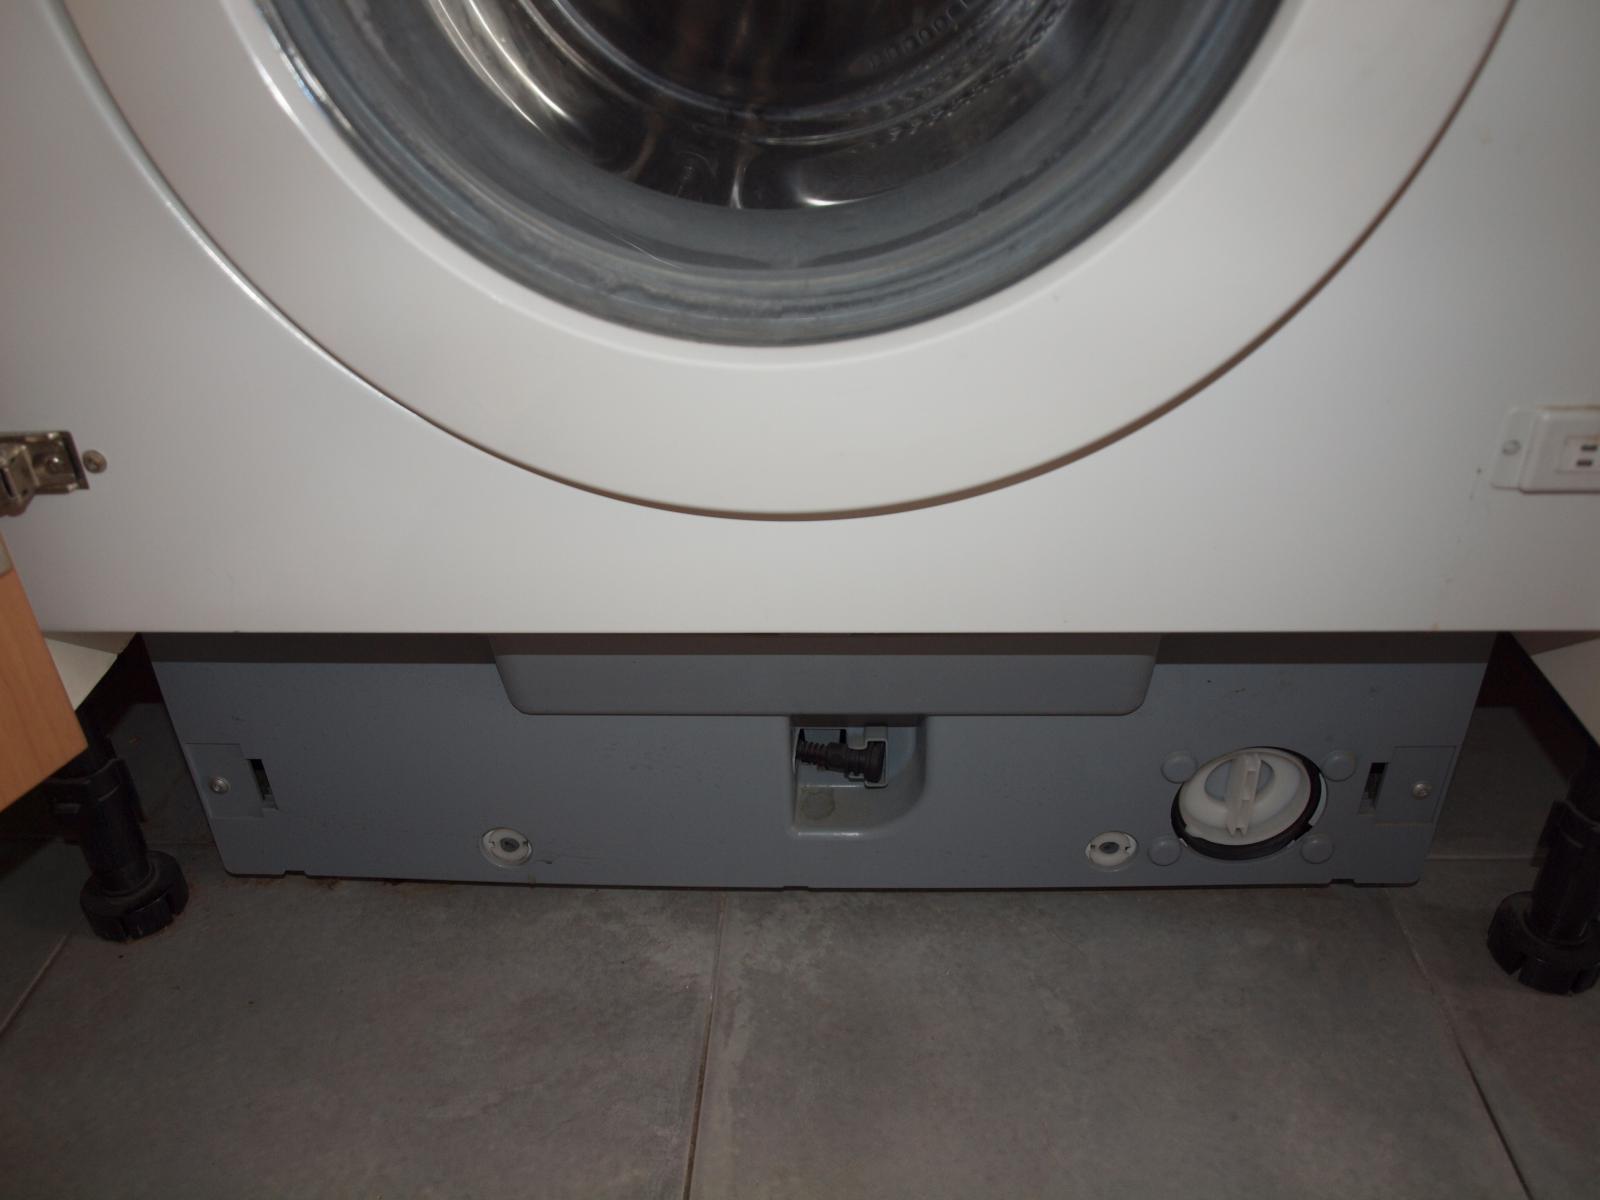 nettoyer machine laver lave linge samsung nettoyer le filtre with